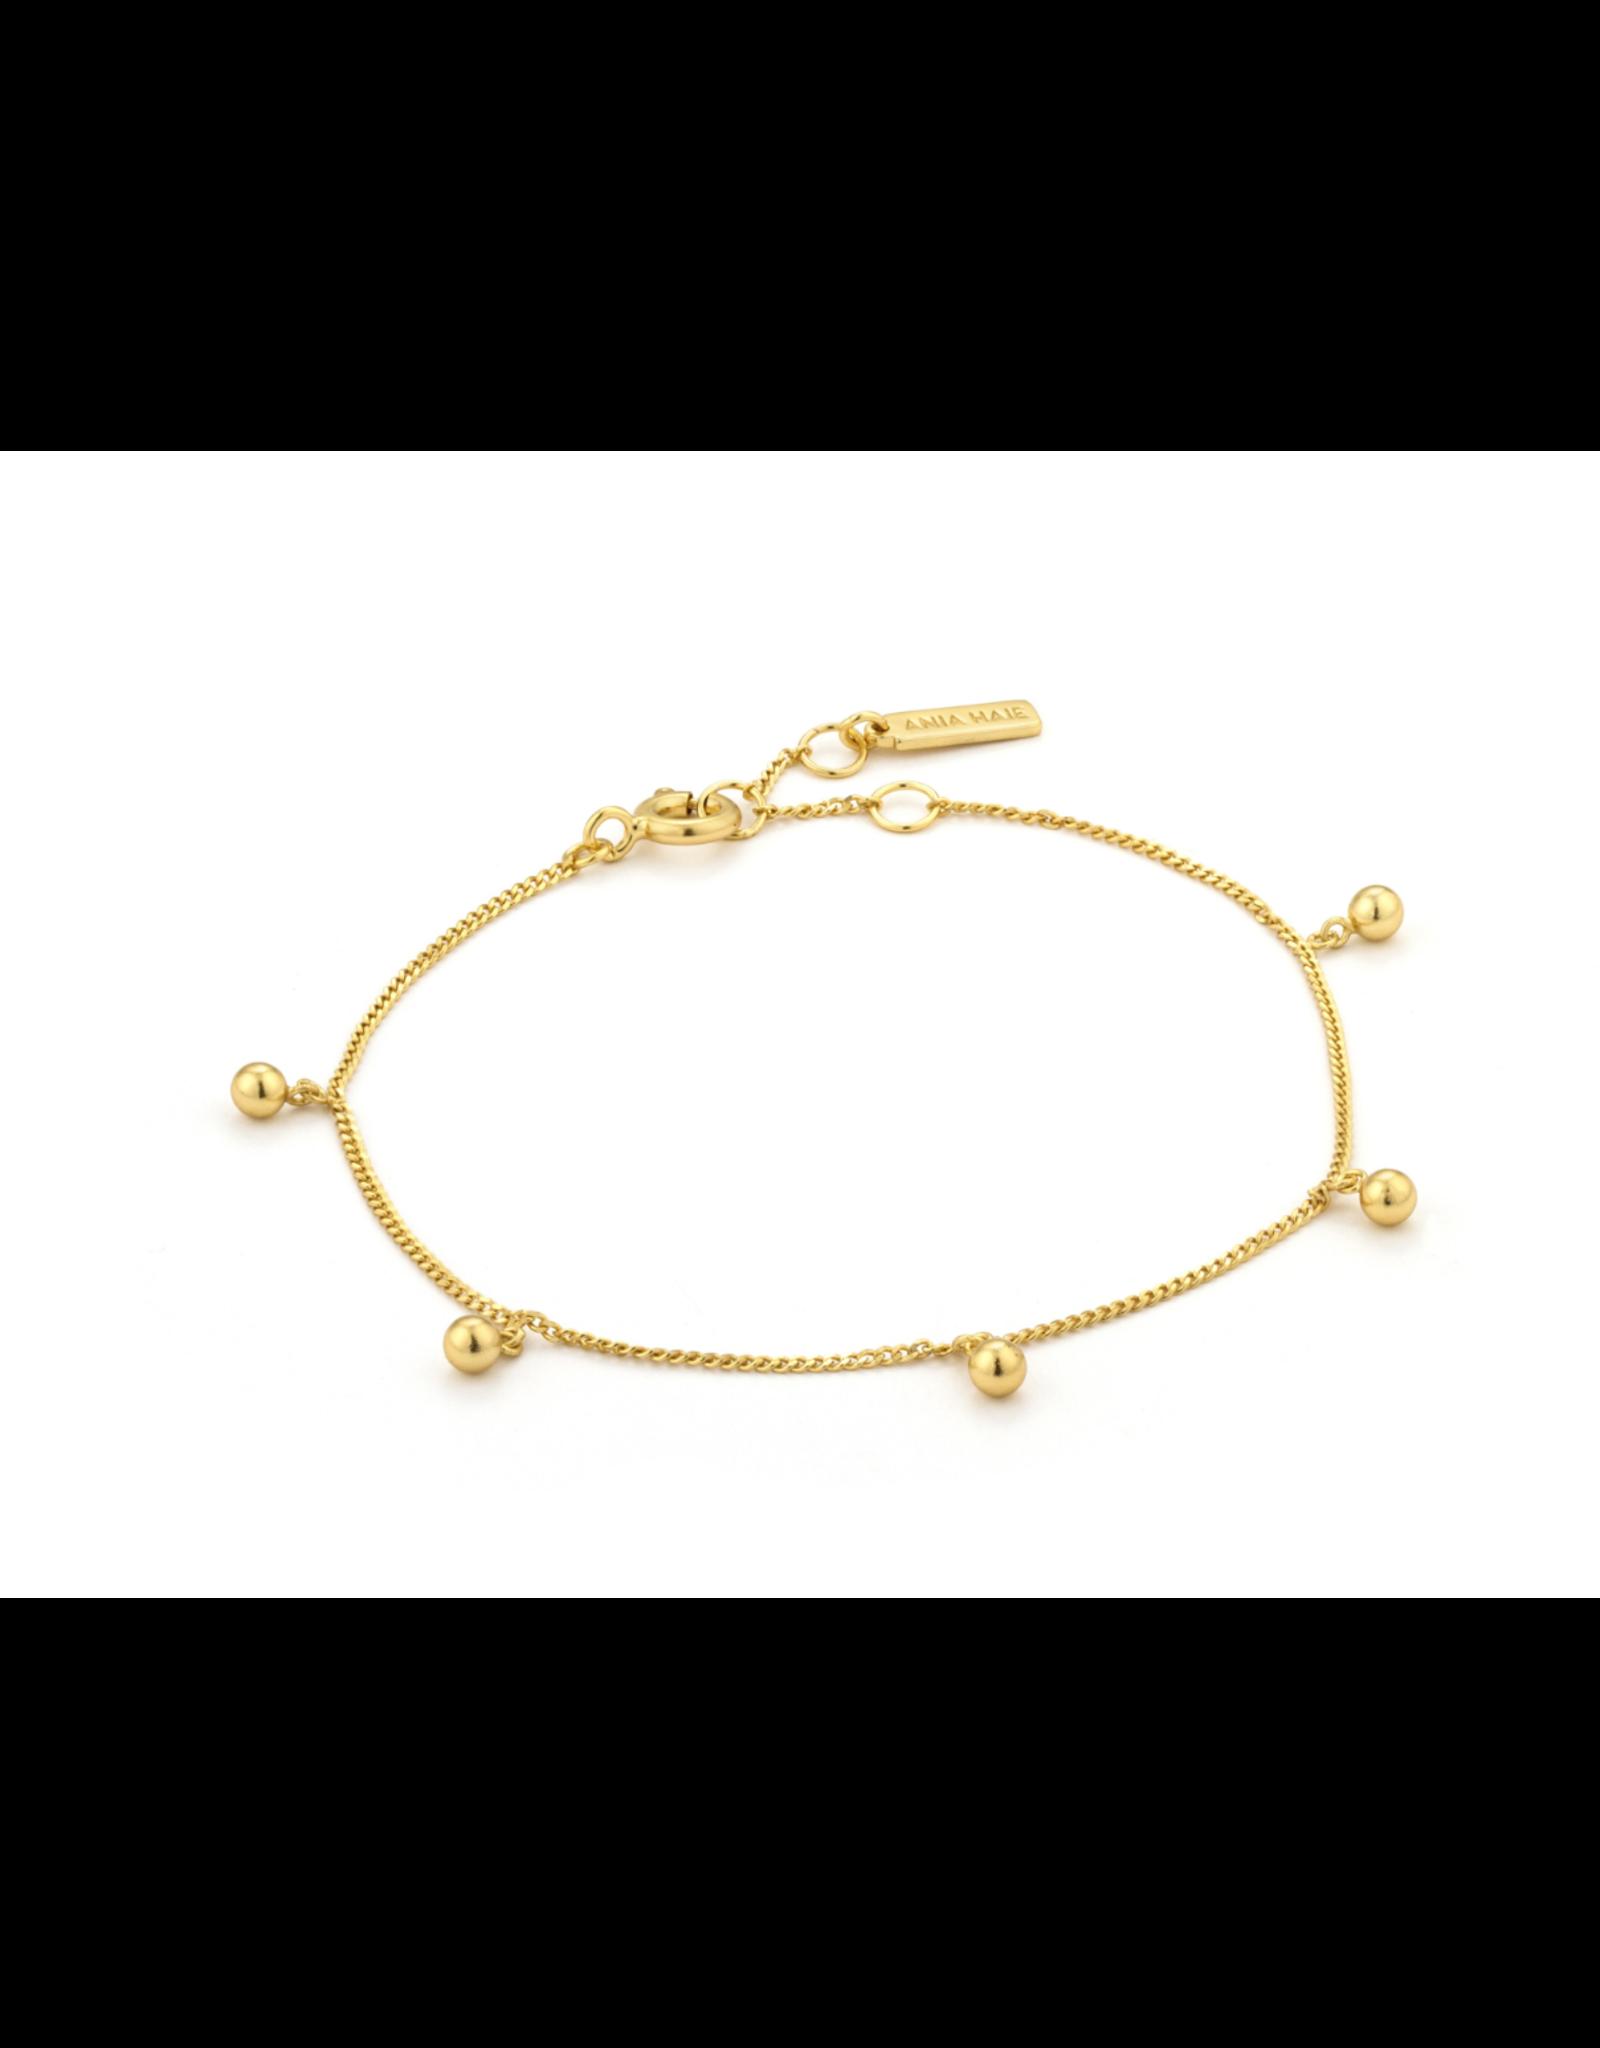 Orbit Drop Balls Bracelet, gold